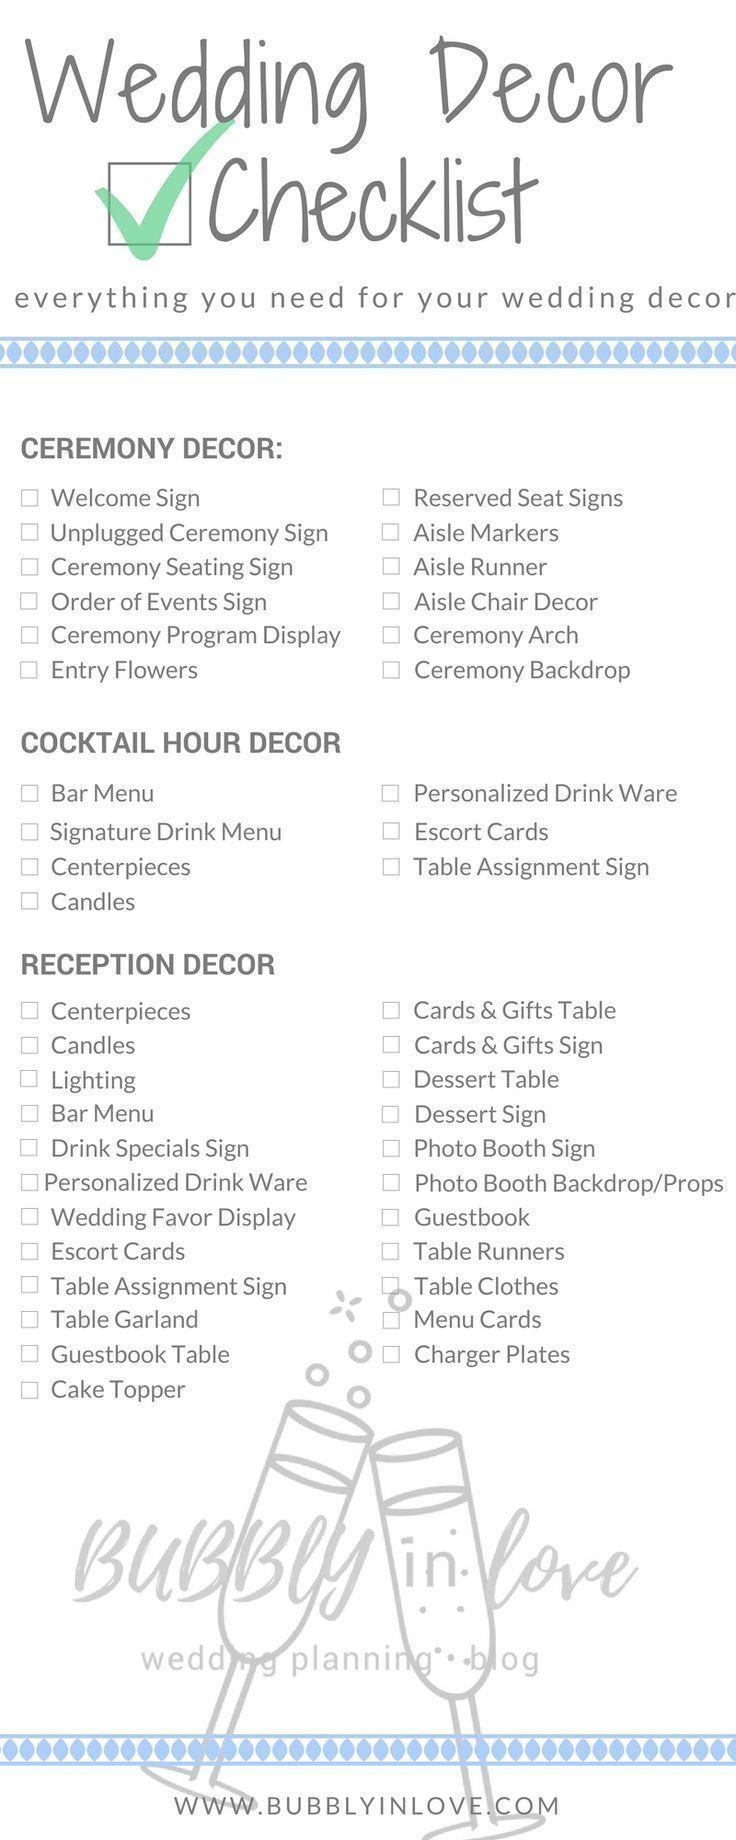 This is so helpful! 👌 Wedding decoration checklist